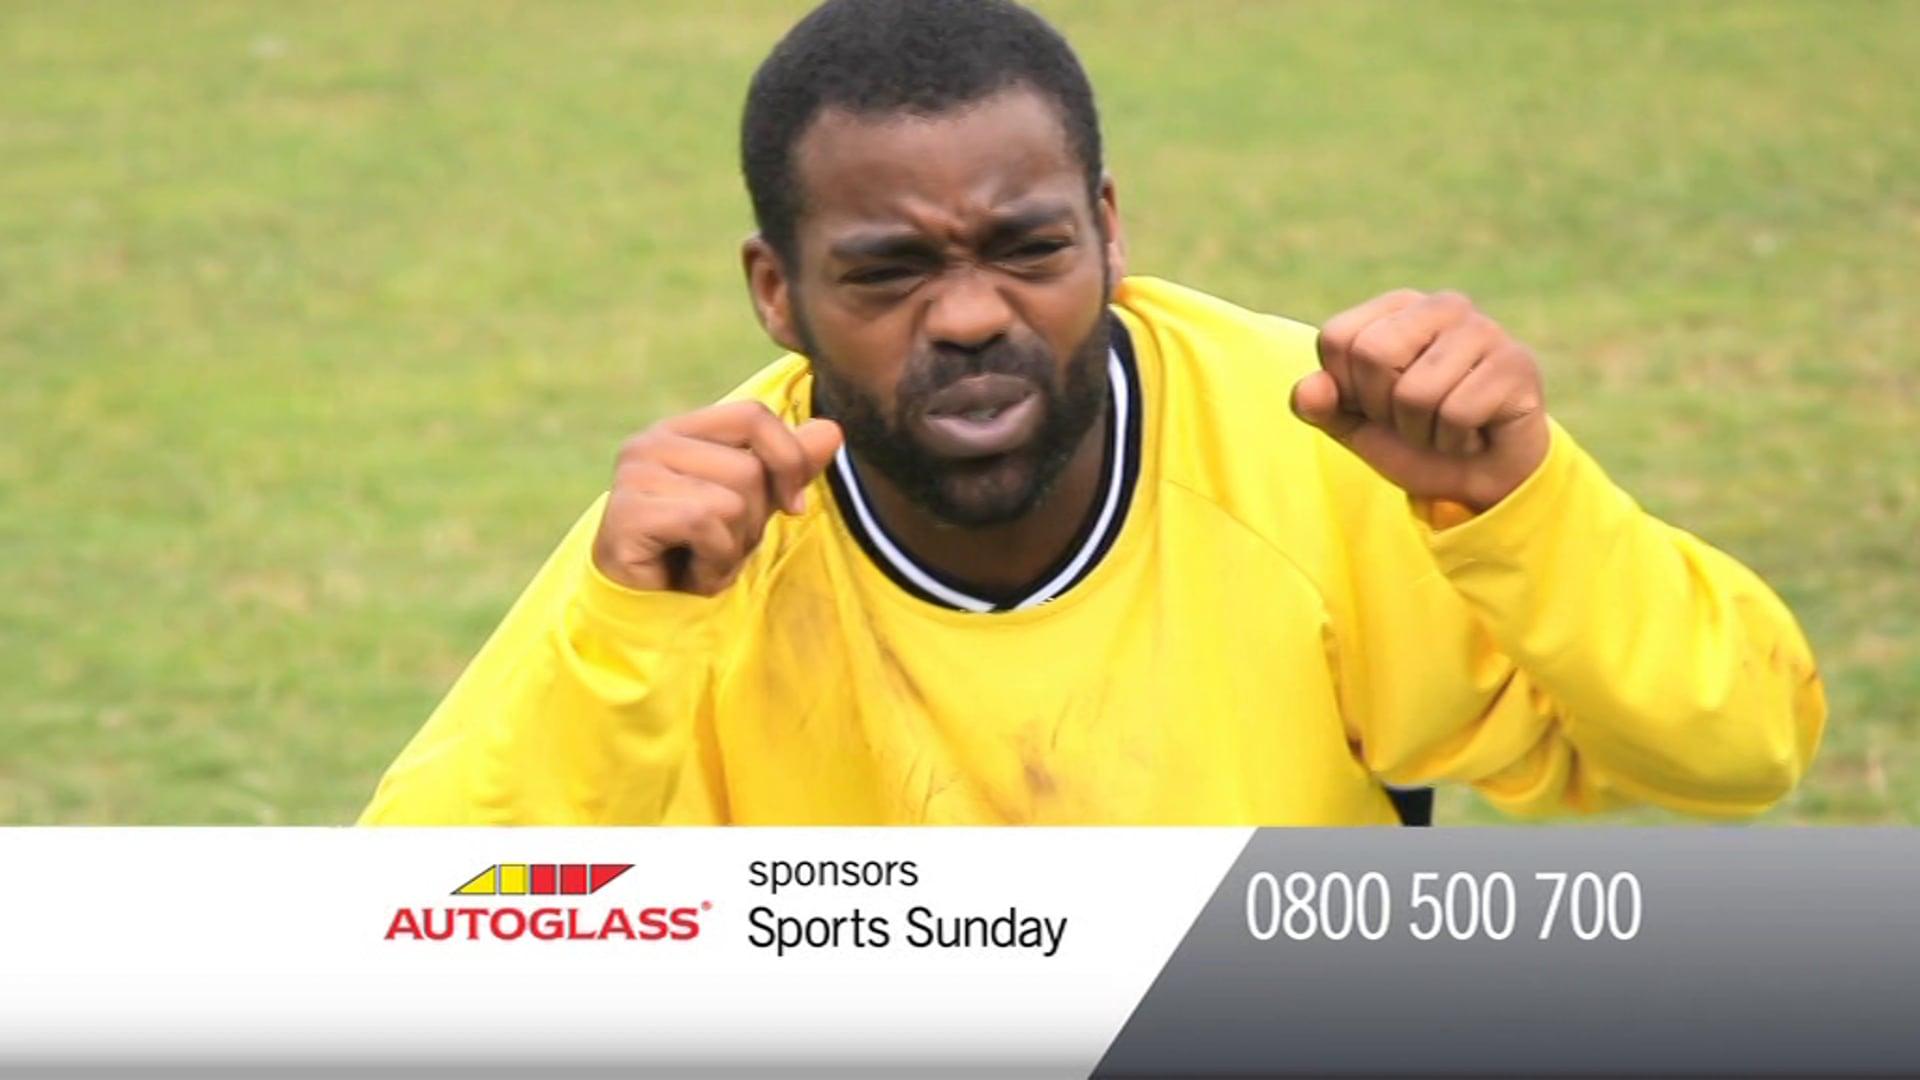 Autoglass Bumpers 'Football'